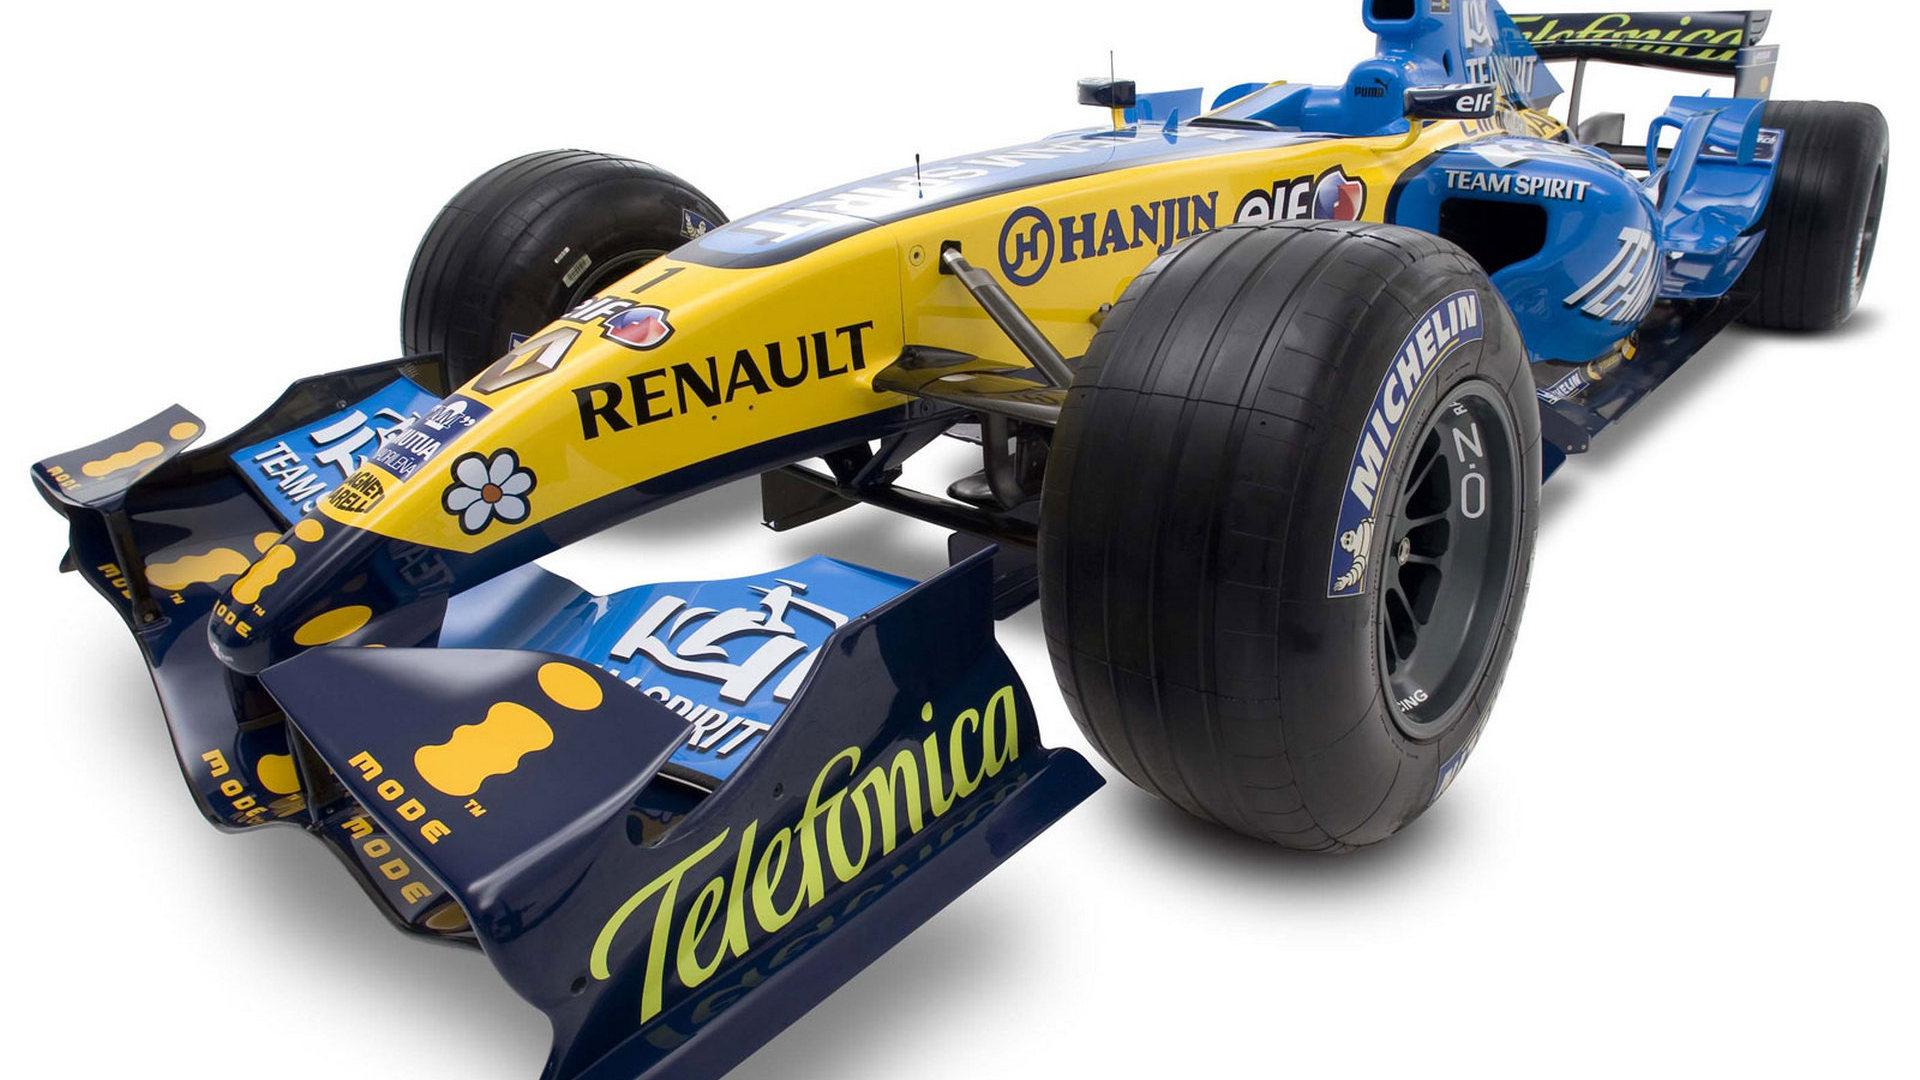 Hd Wallpapers 2005 Formula 1 Car Launches: HD Wallpapers 2006 Formula 1 Car Launches